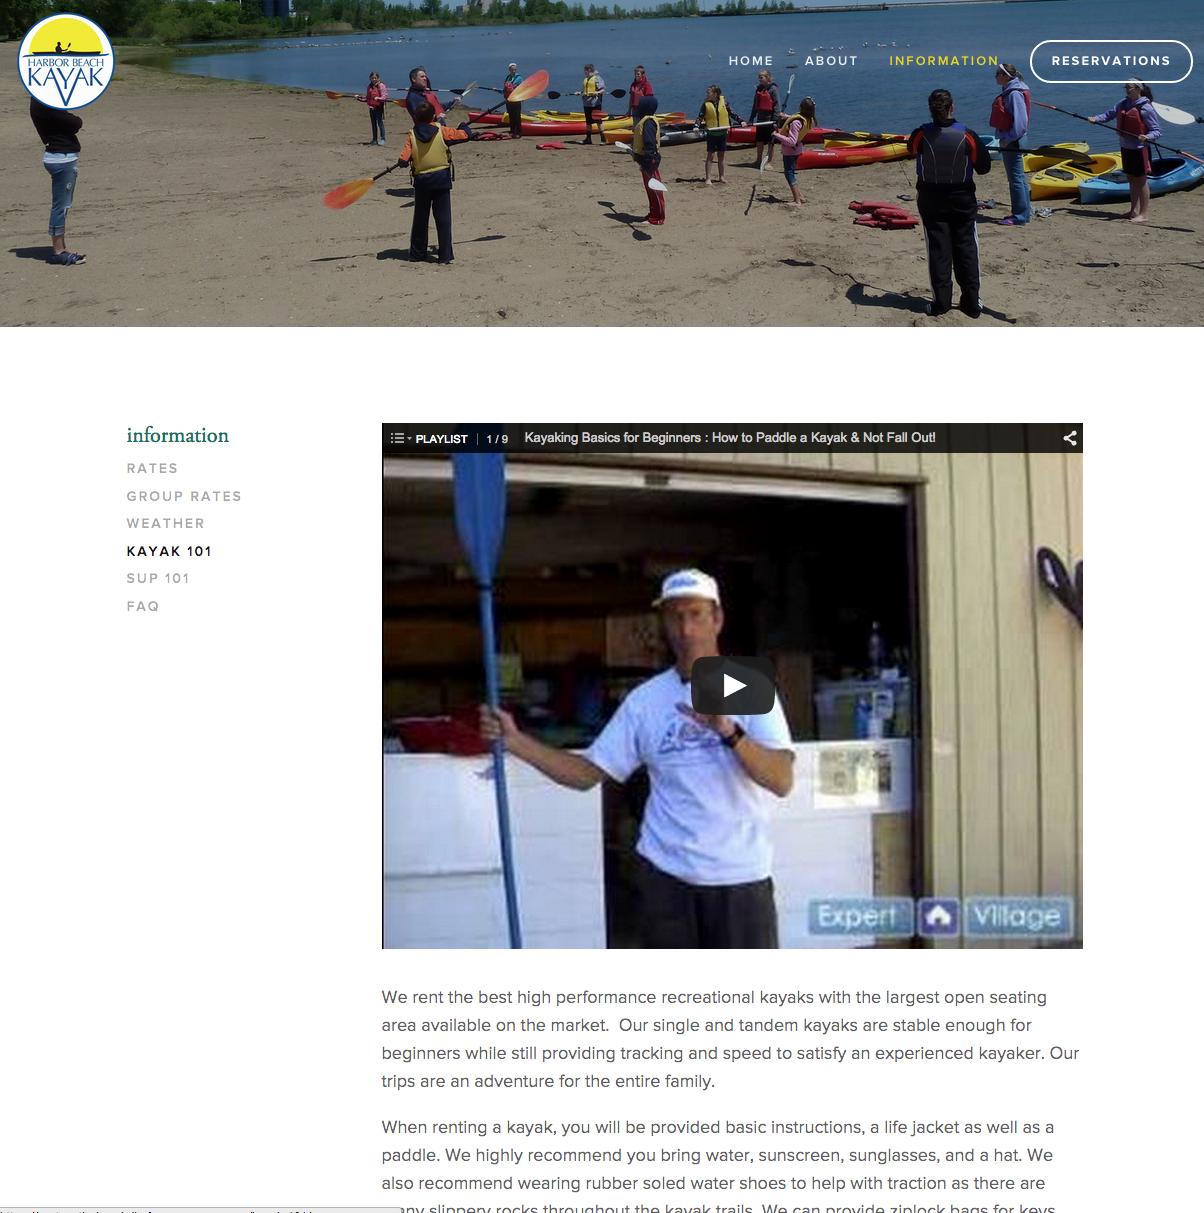 HBK New site Kayak 101.png